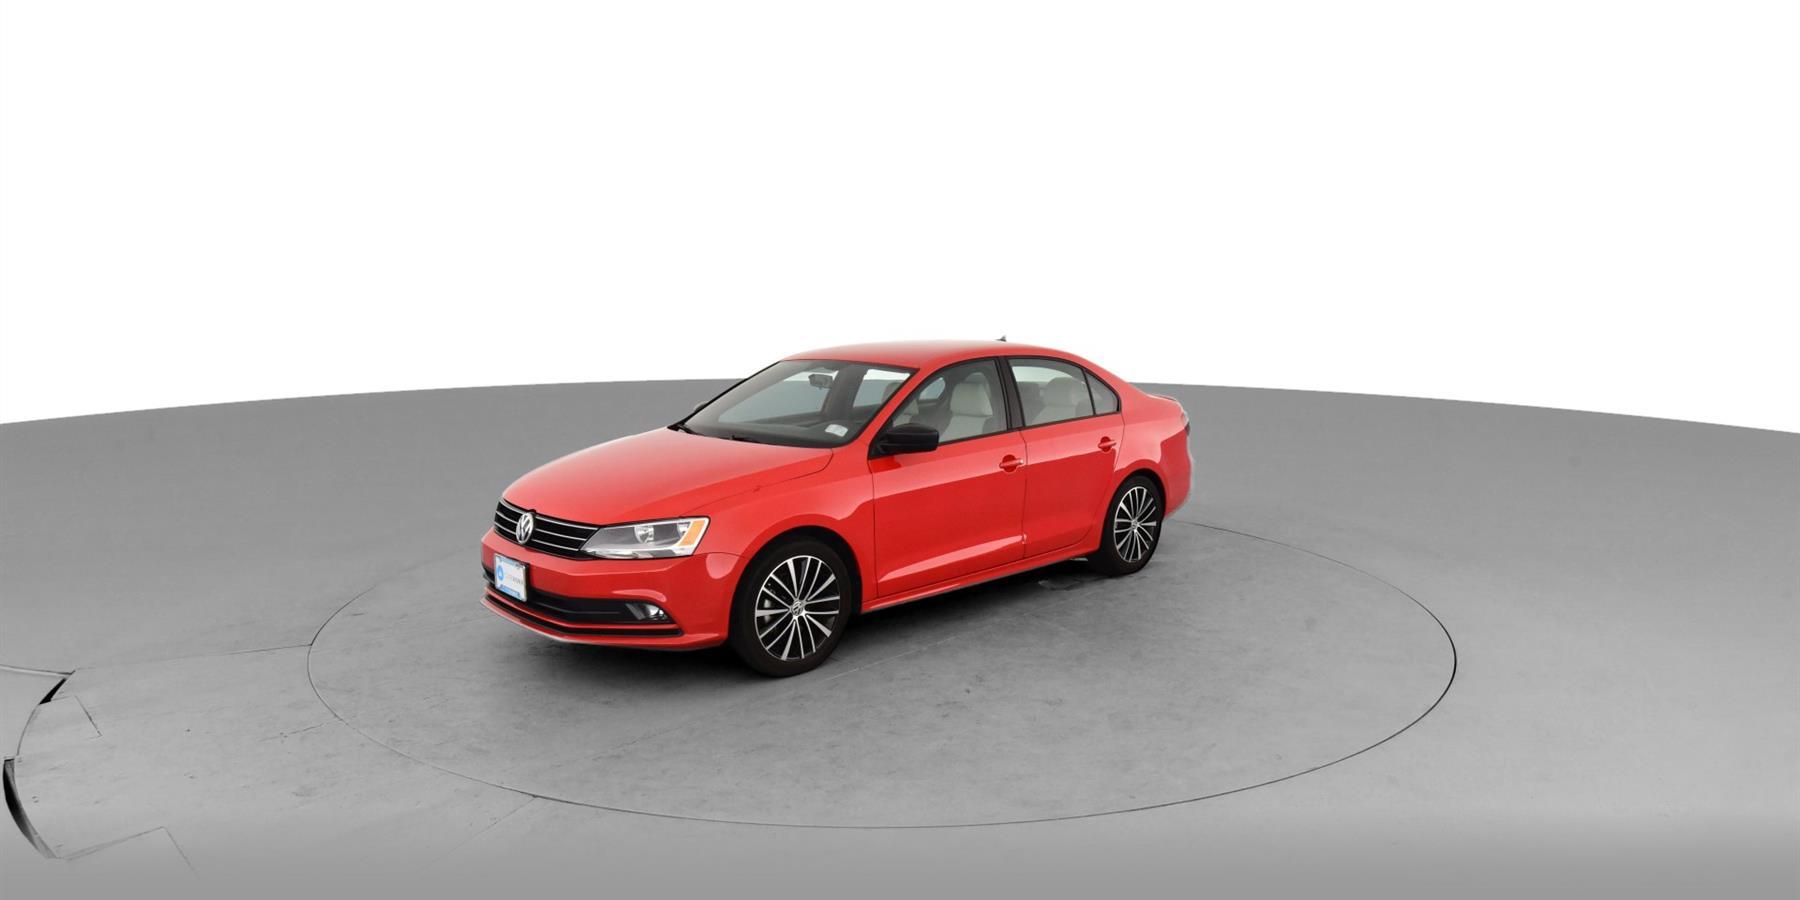 2016 Volkswagen Jetta 1 8T Sport Sedan 4D for Sale | Carvana®